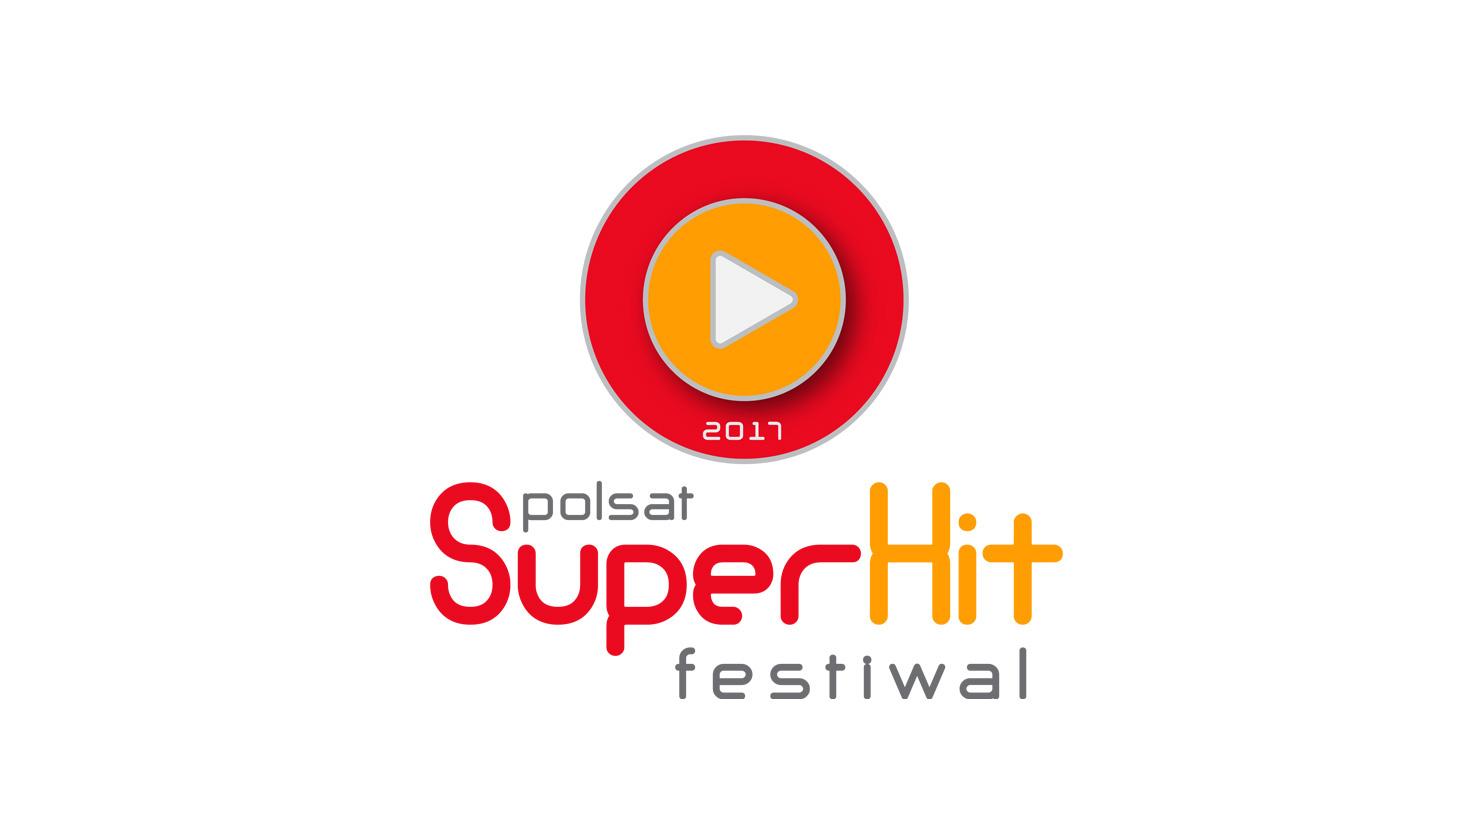 2017-04-25 Polsat SuperHit Festiwal 2017 od 26 do 28 maja